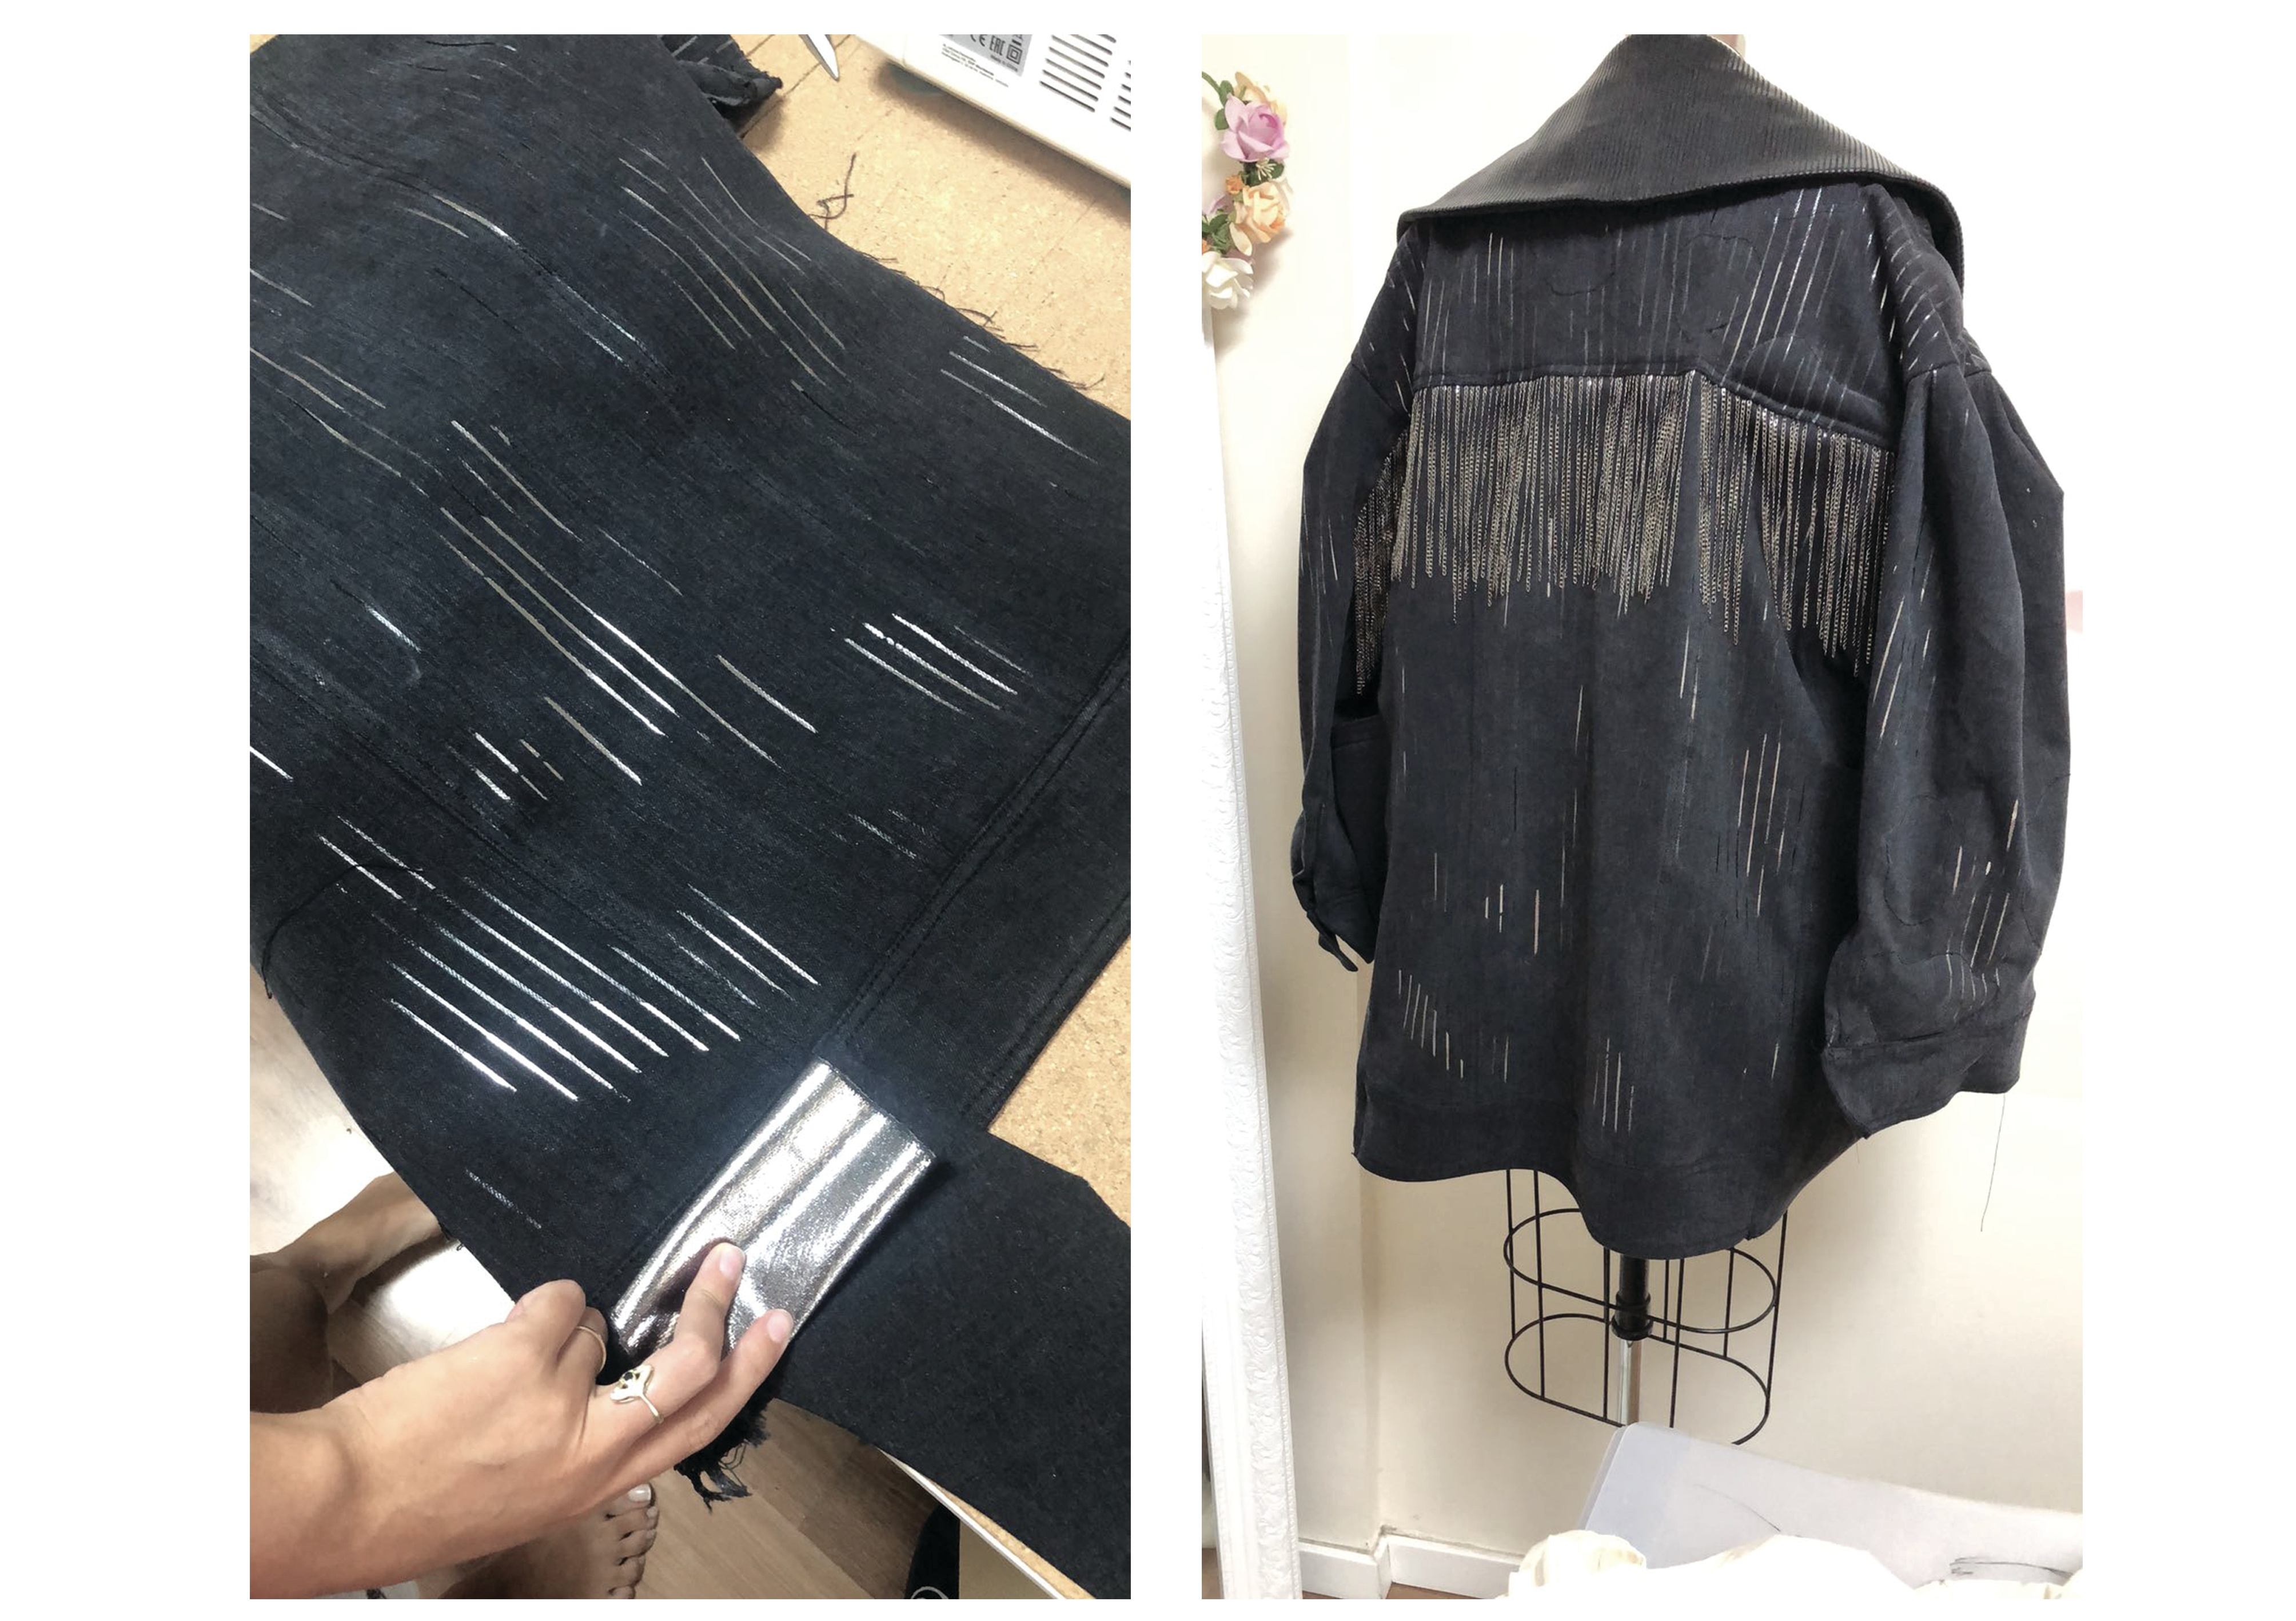 Textil Manipulation